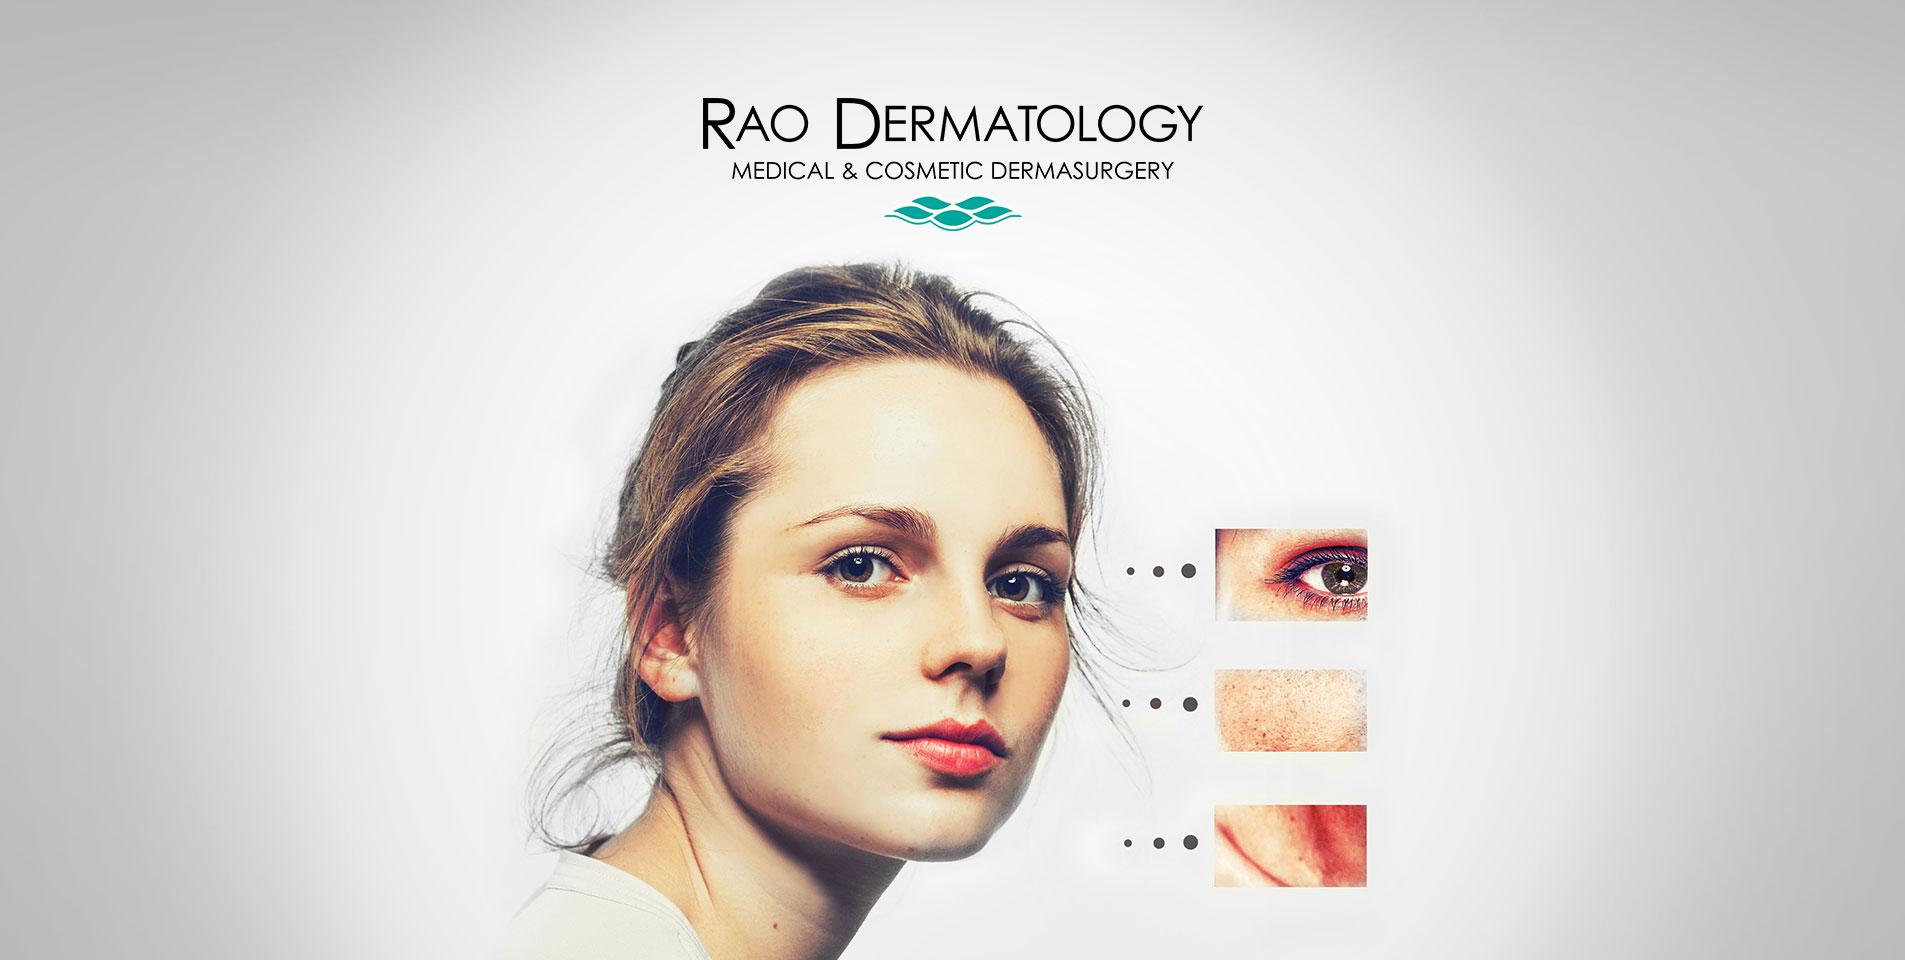 Rao-Dermatology-Skin-Care